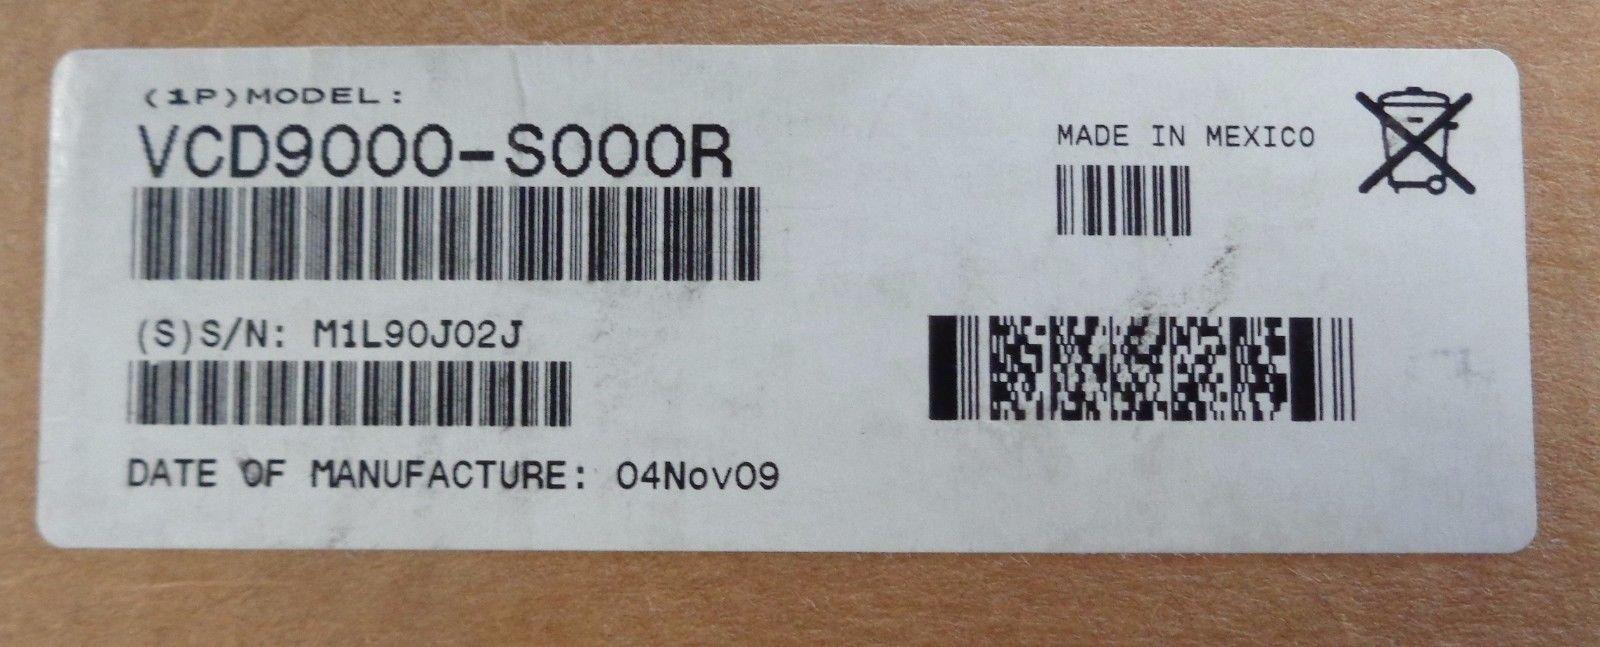 VCD9000-S000R   CRADLE:VEHICLE,GEMINI SHORT